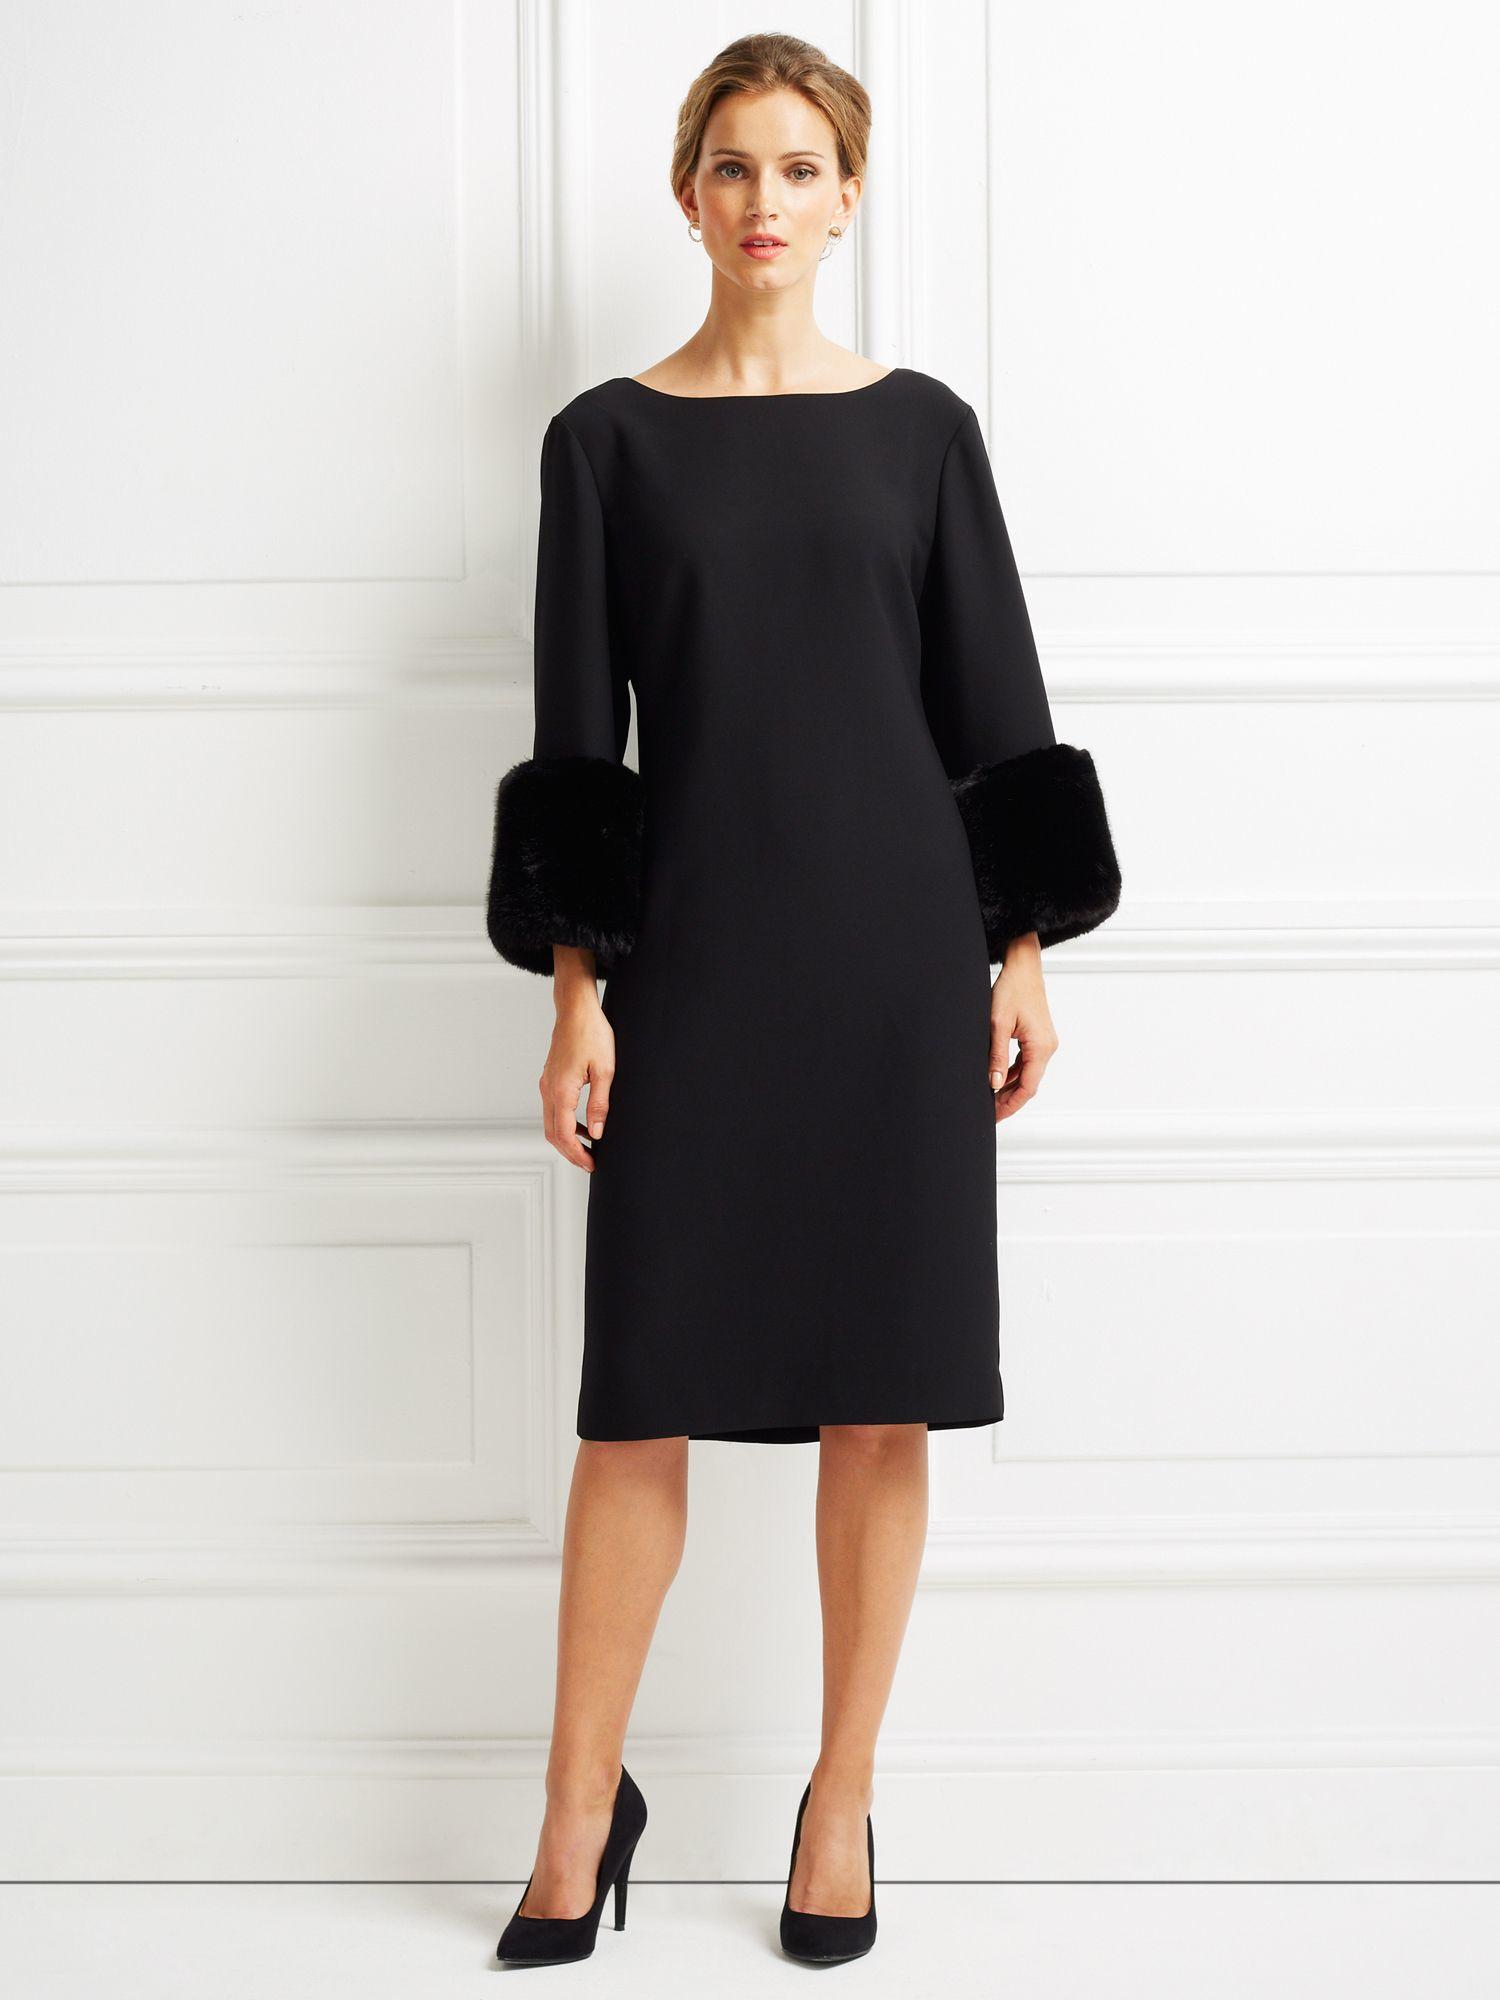 Jacques Vert Faux Fur Cuff Shift Dress In Black Lyst